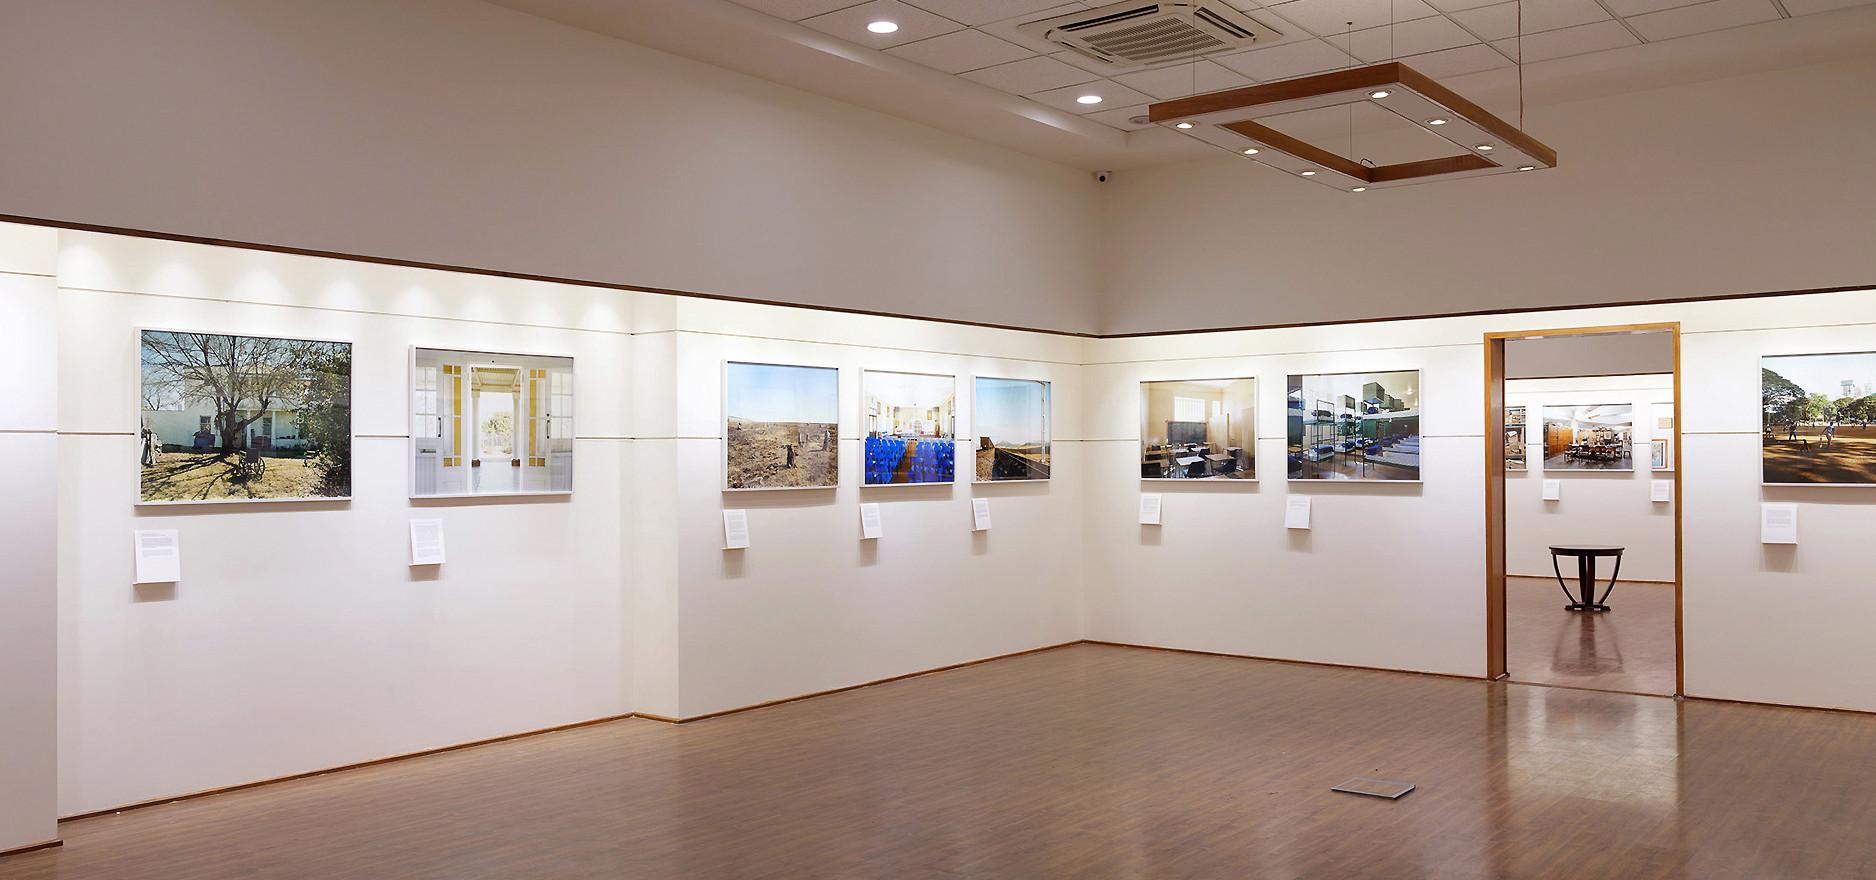 Satya Art Gallery, Ahmedabad, India, 2020